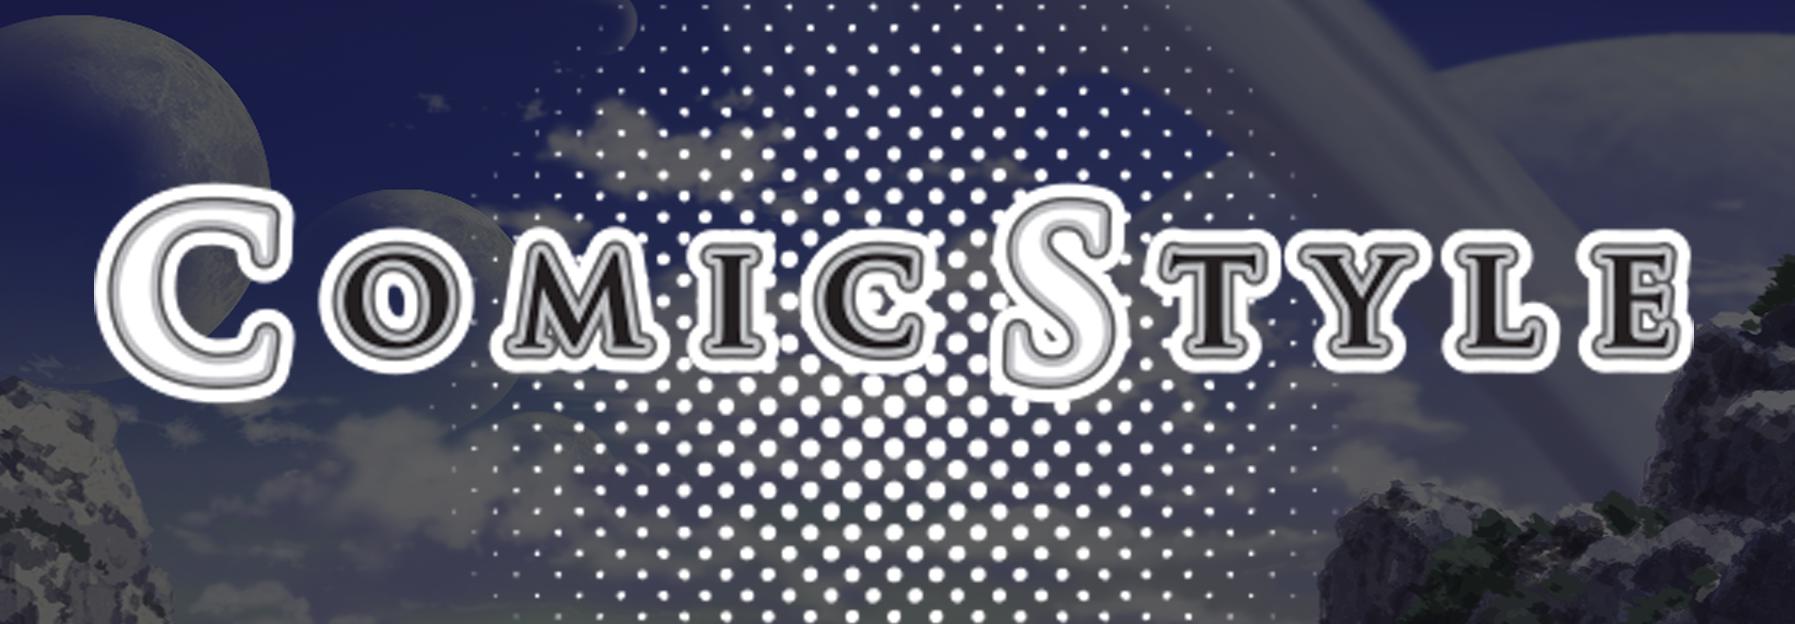 BUSTA EXTRA EB01: COMIC STYLE